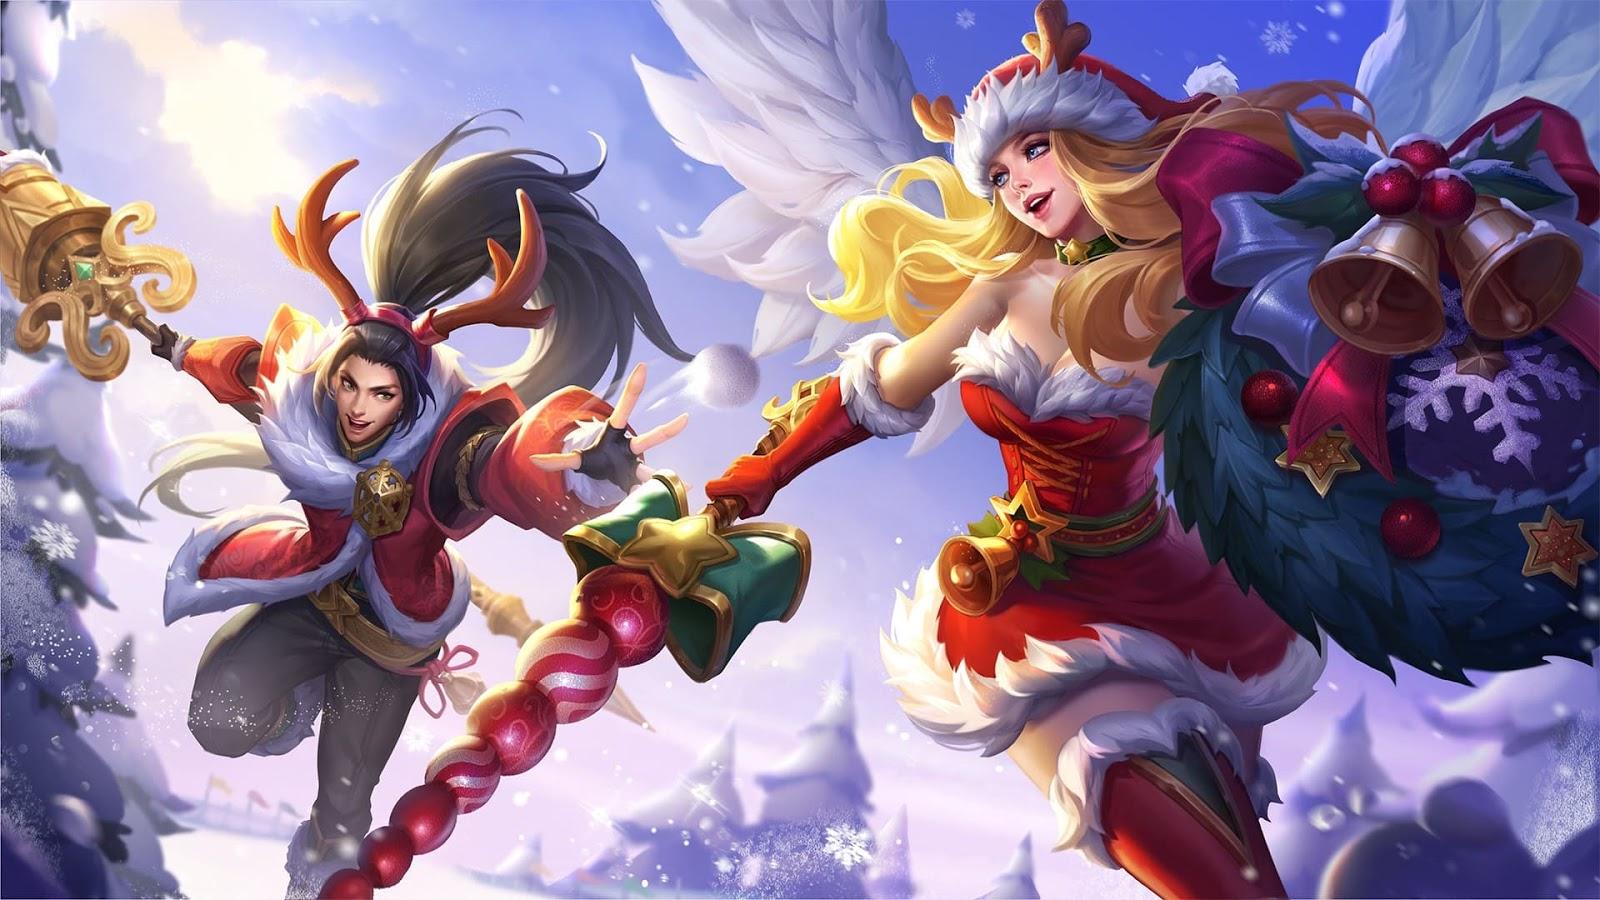 Wallpaper Zilong and Freya Christmas Carnival Skin Mobile Legends HD for PC